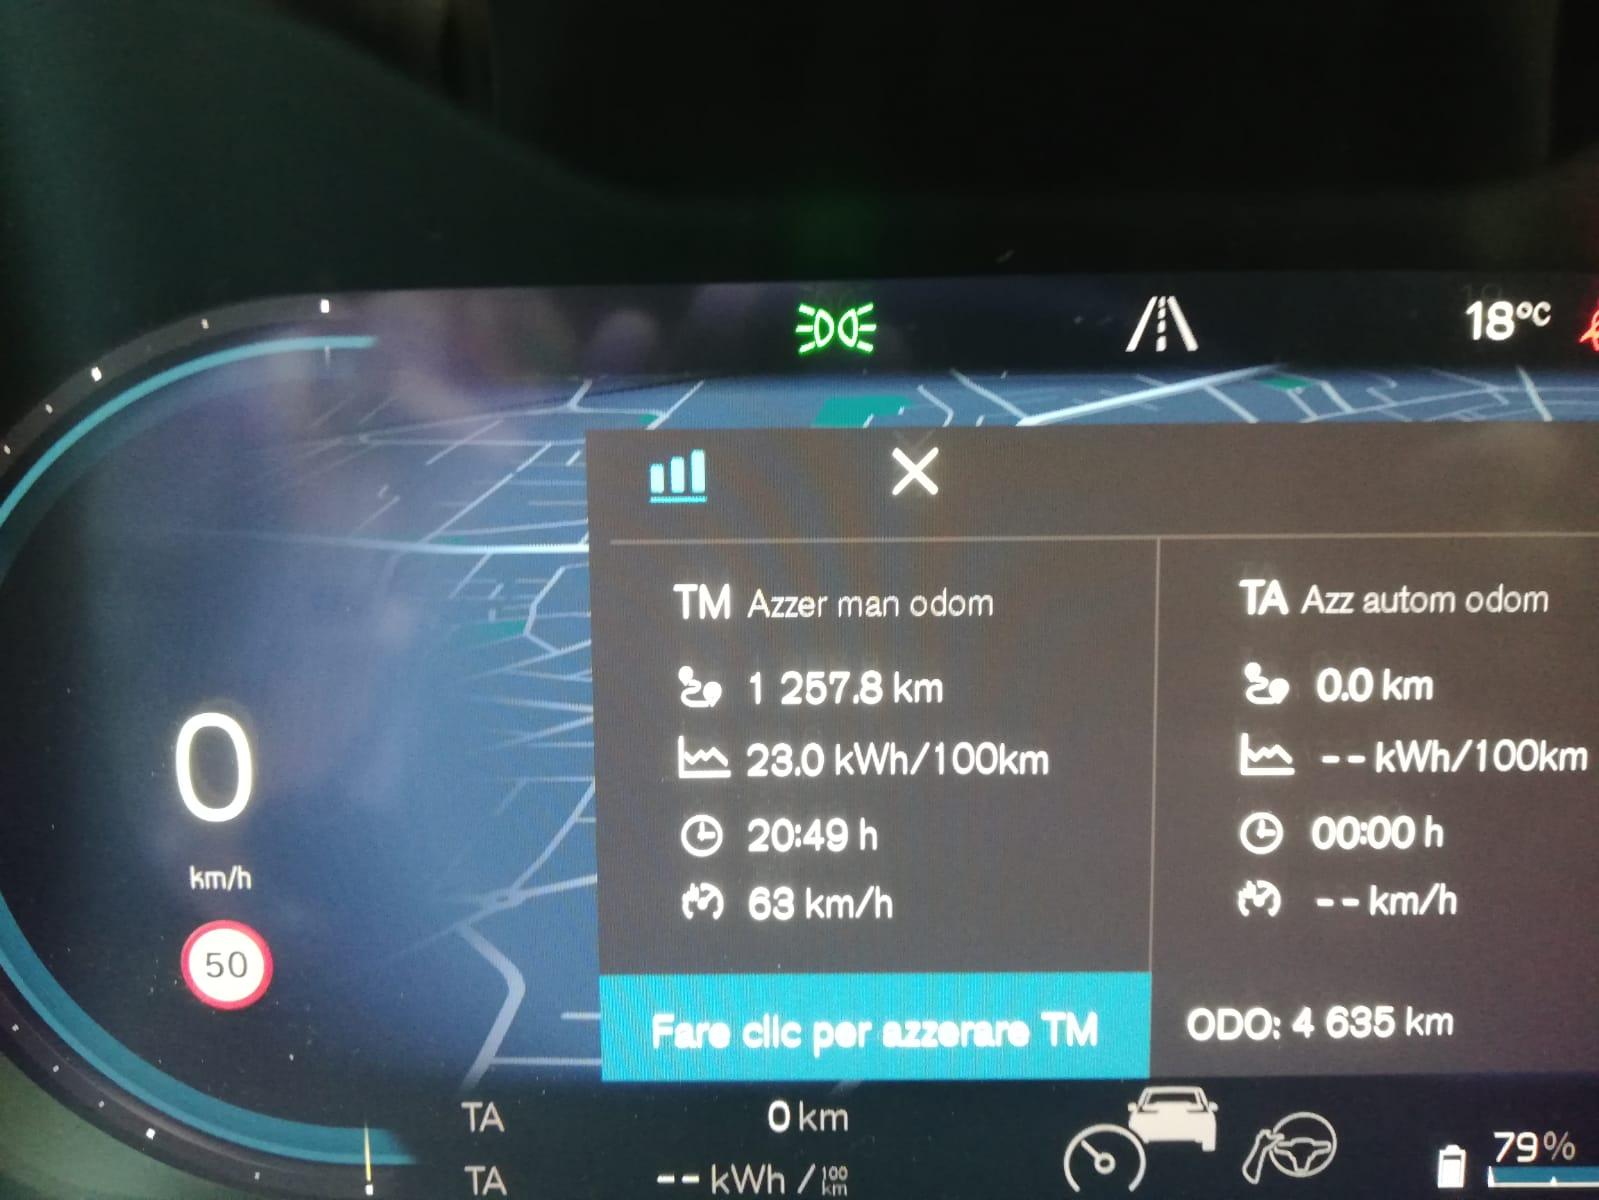 Volvo XC40 elettrica in flotta